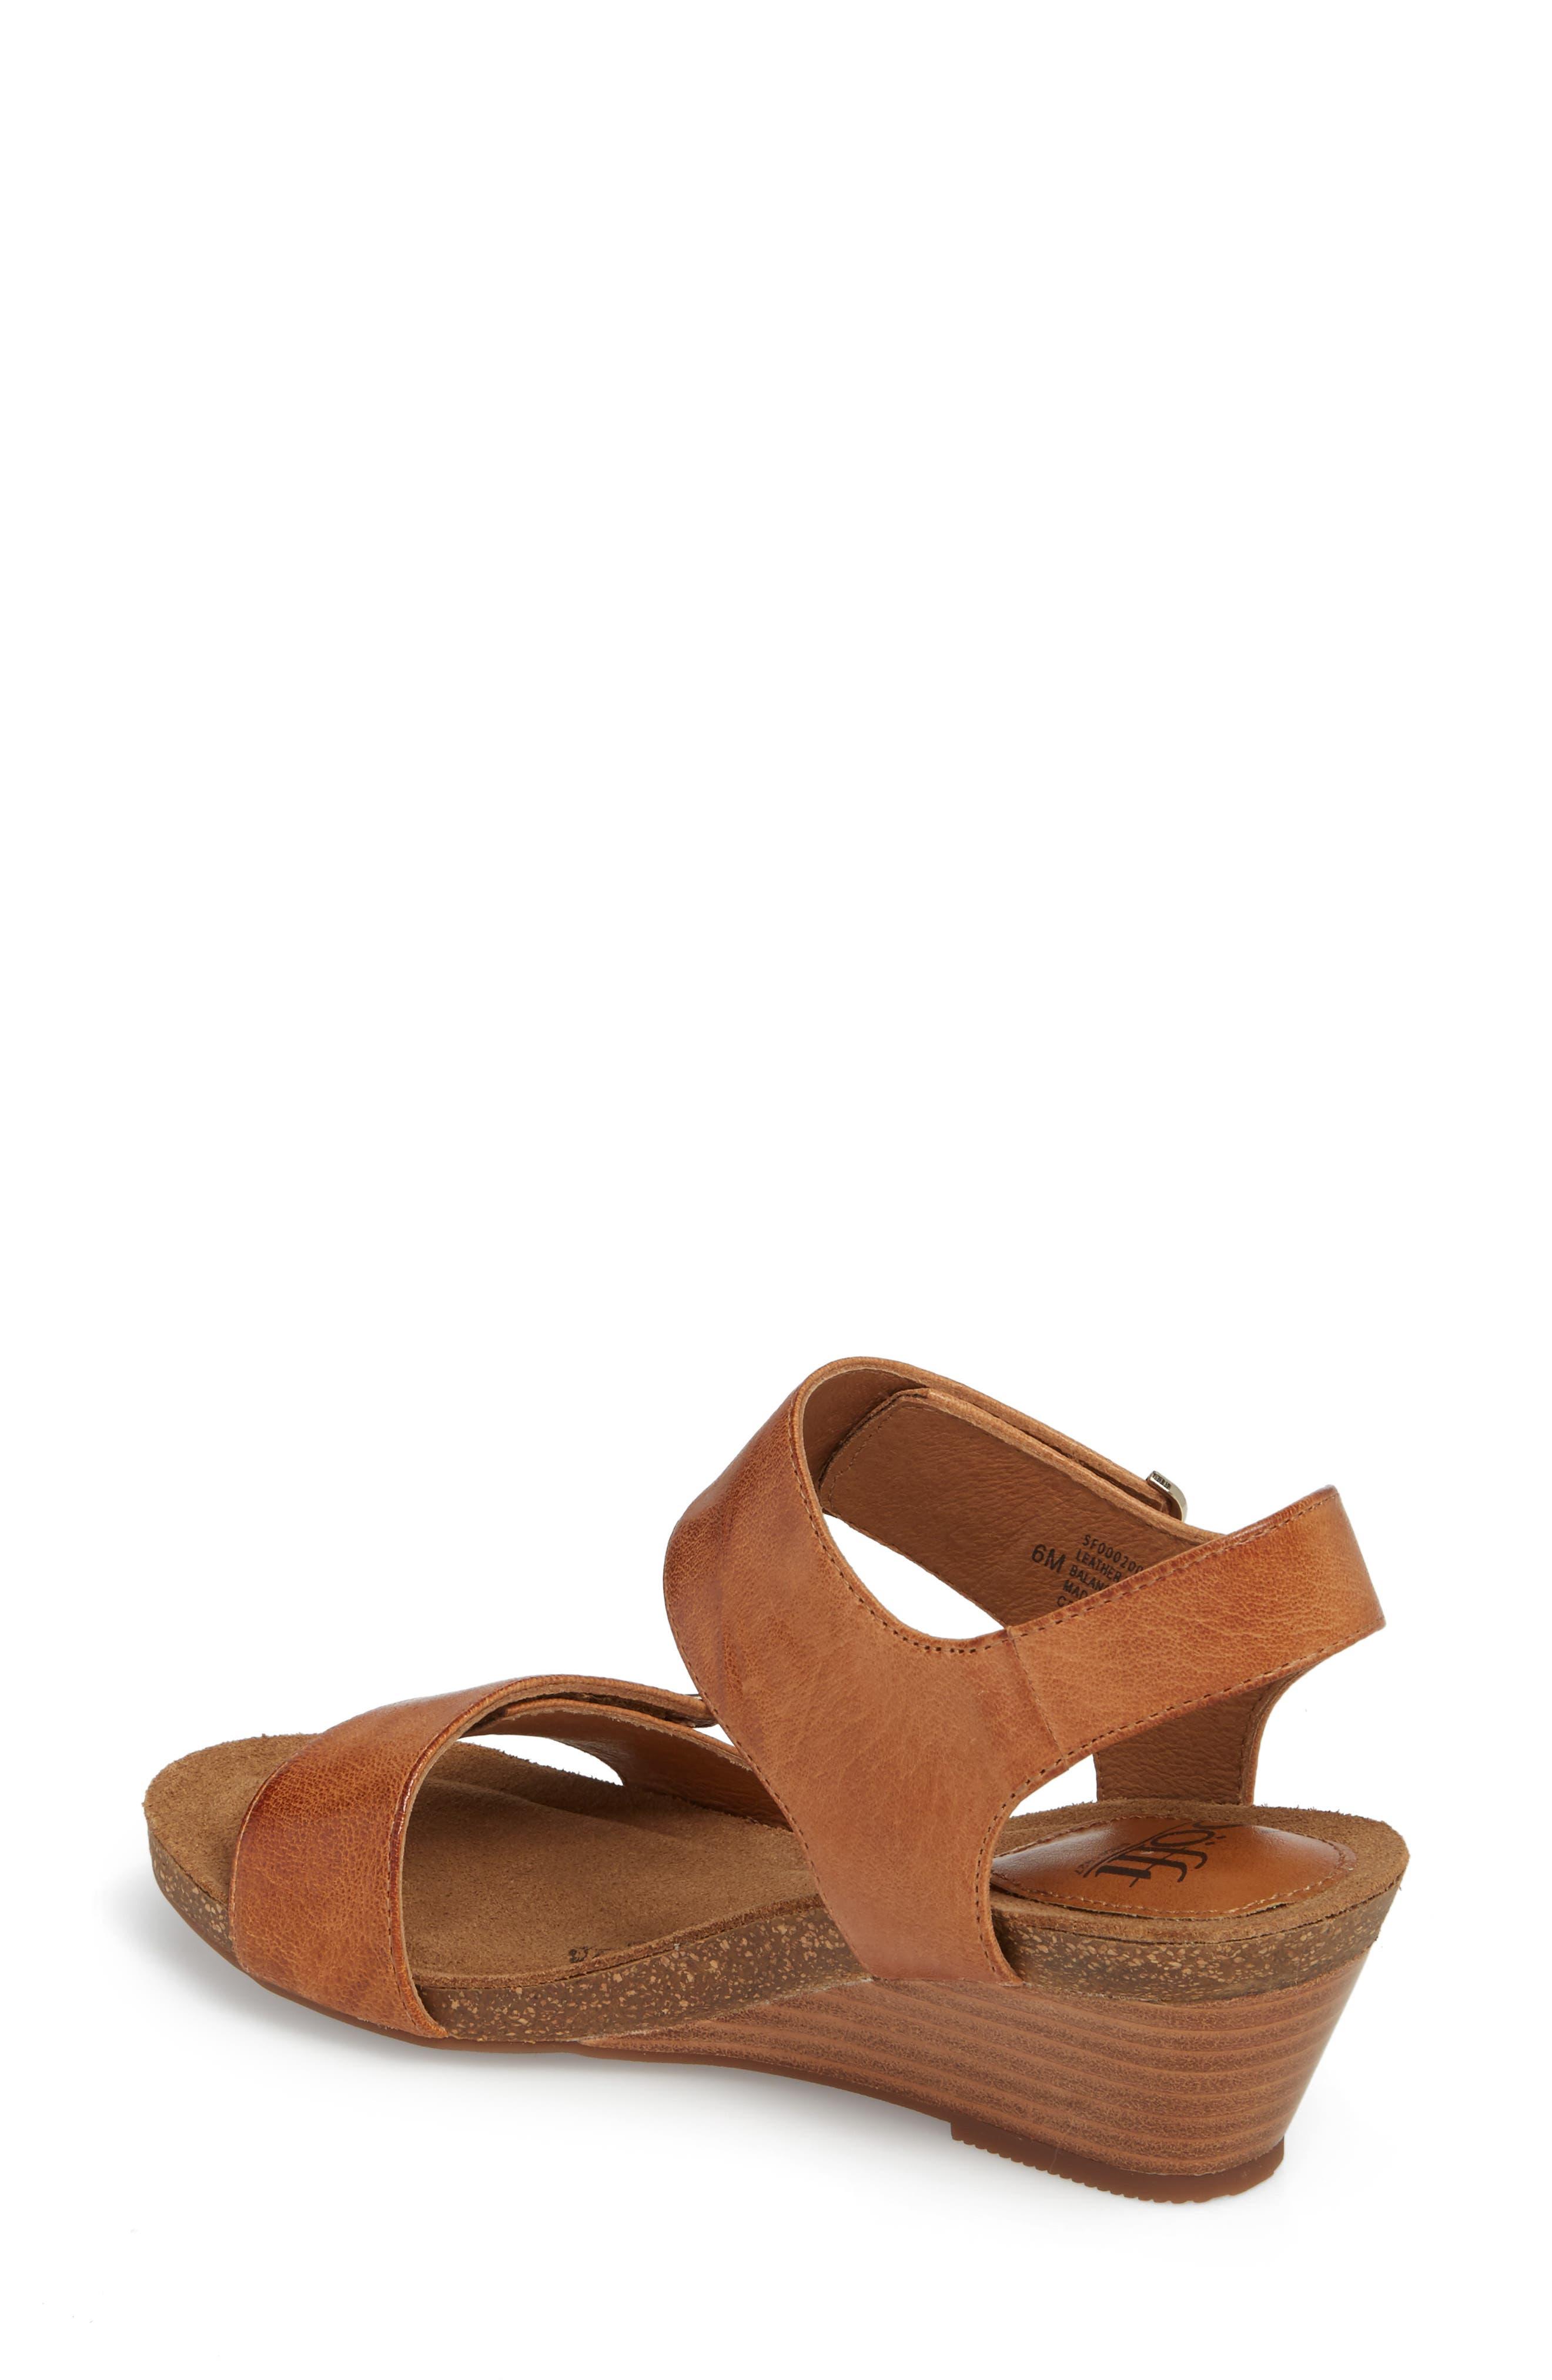 Verdi Wedge Sandal,                             Alternate thumbnail 2, color,                             Luggage Leather